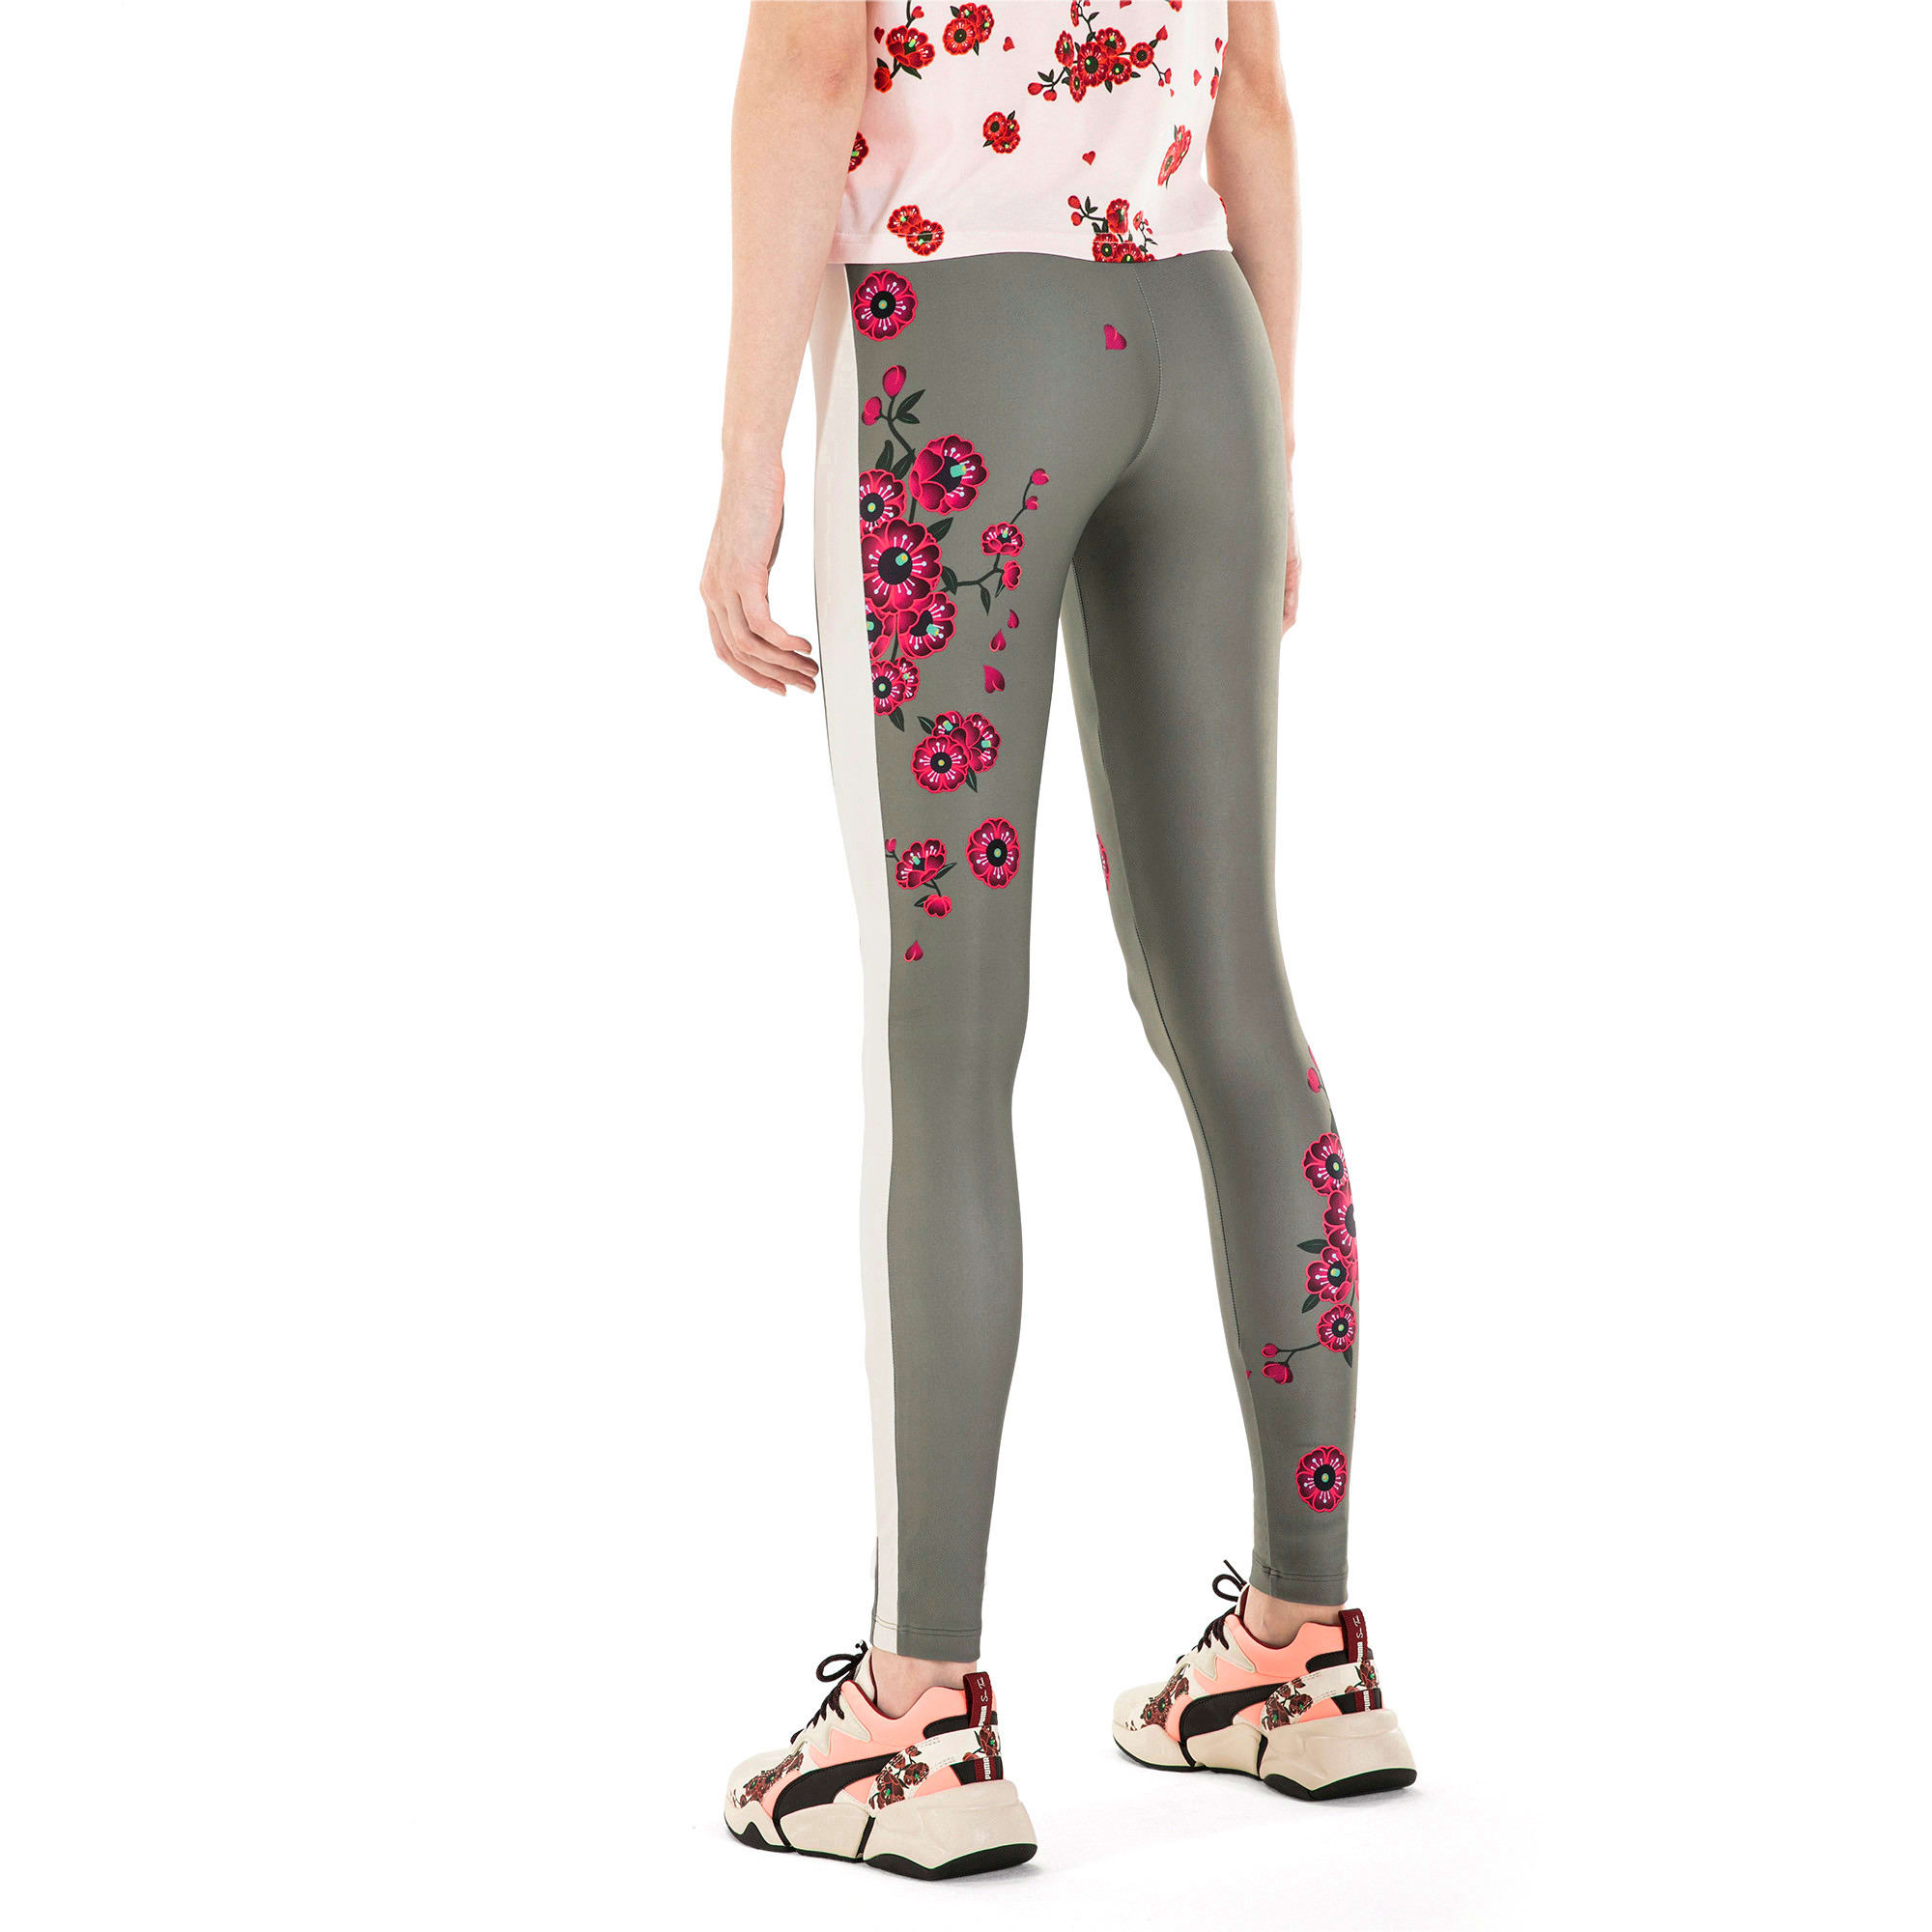 Thumbnail 3 van PUMA x SUE TSAI Blossom legging voor vrouwen, -Olivine, medium